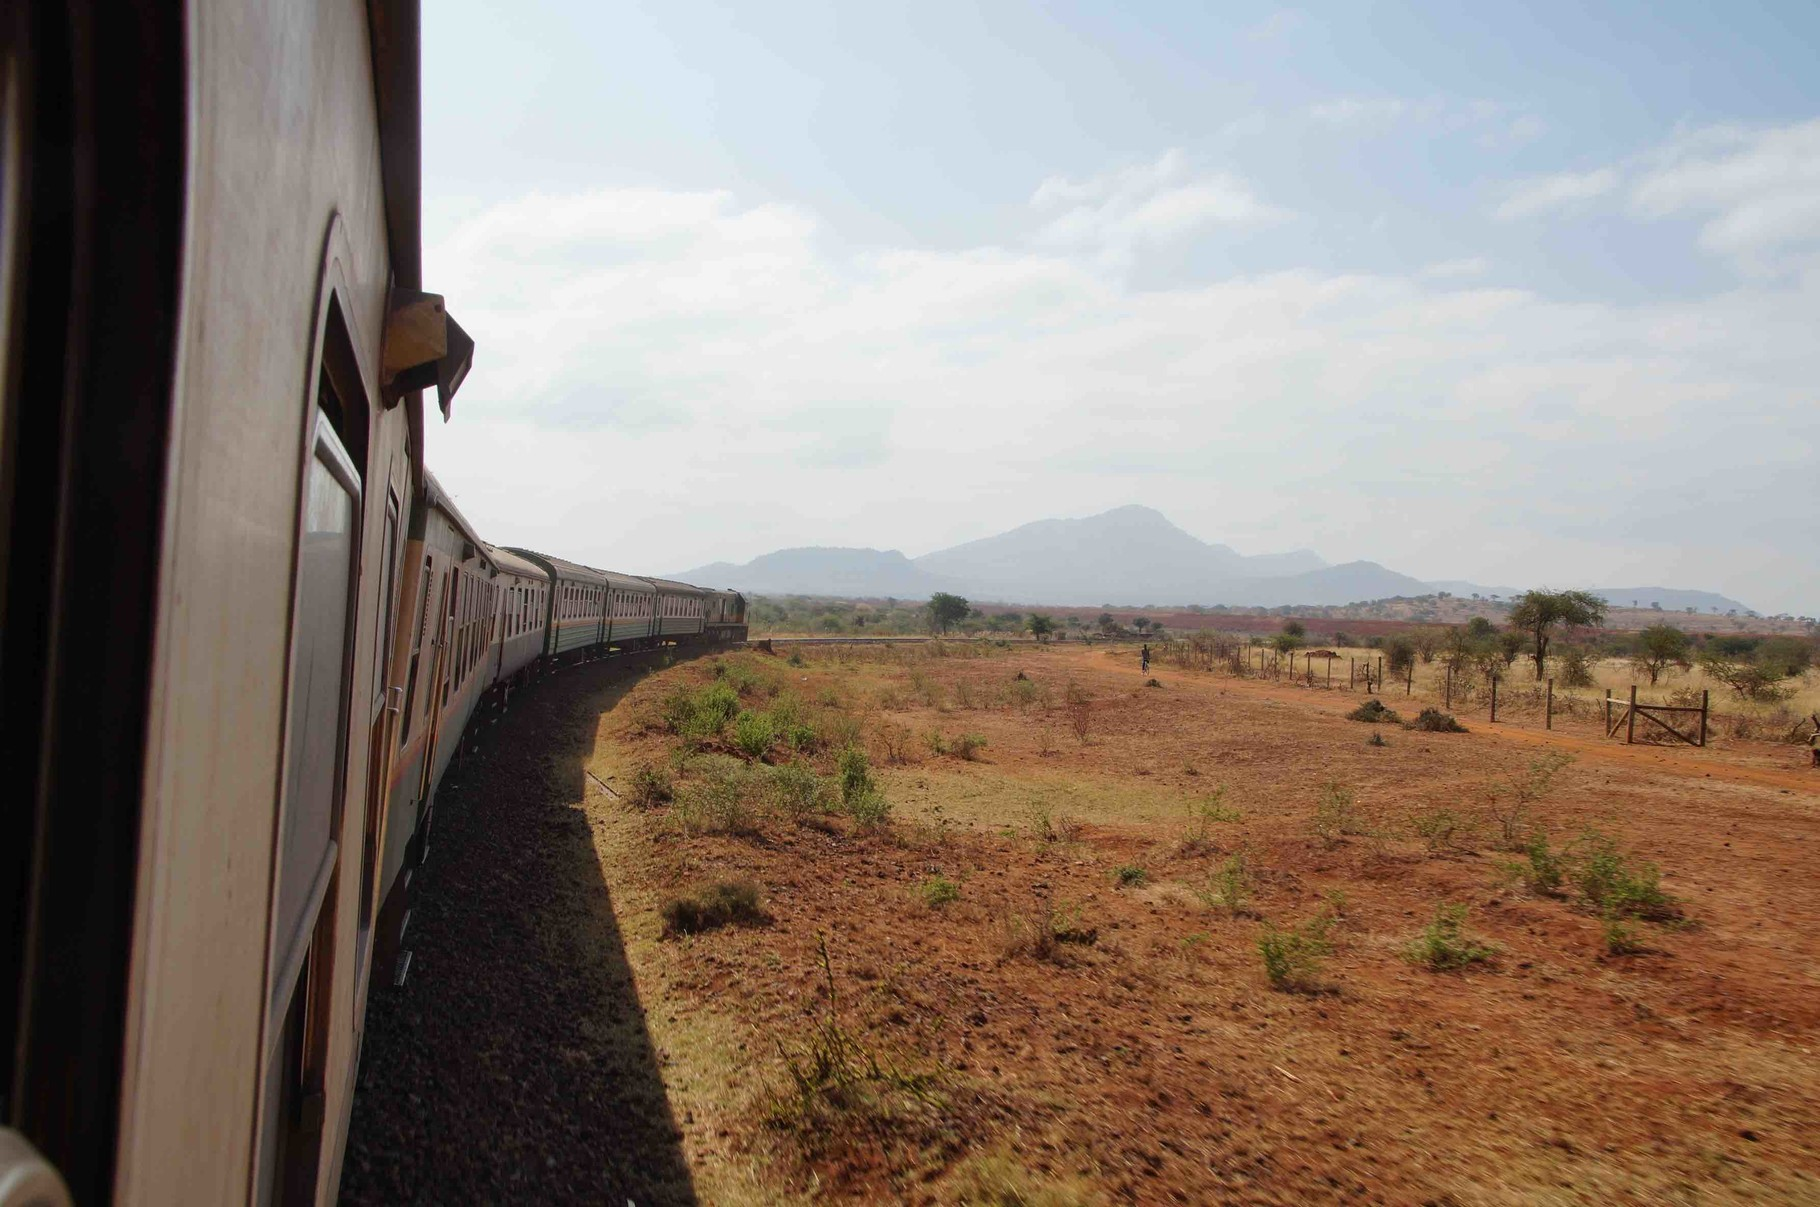 Bahnfahrt von Nairobi nach Mombasa